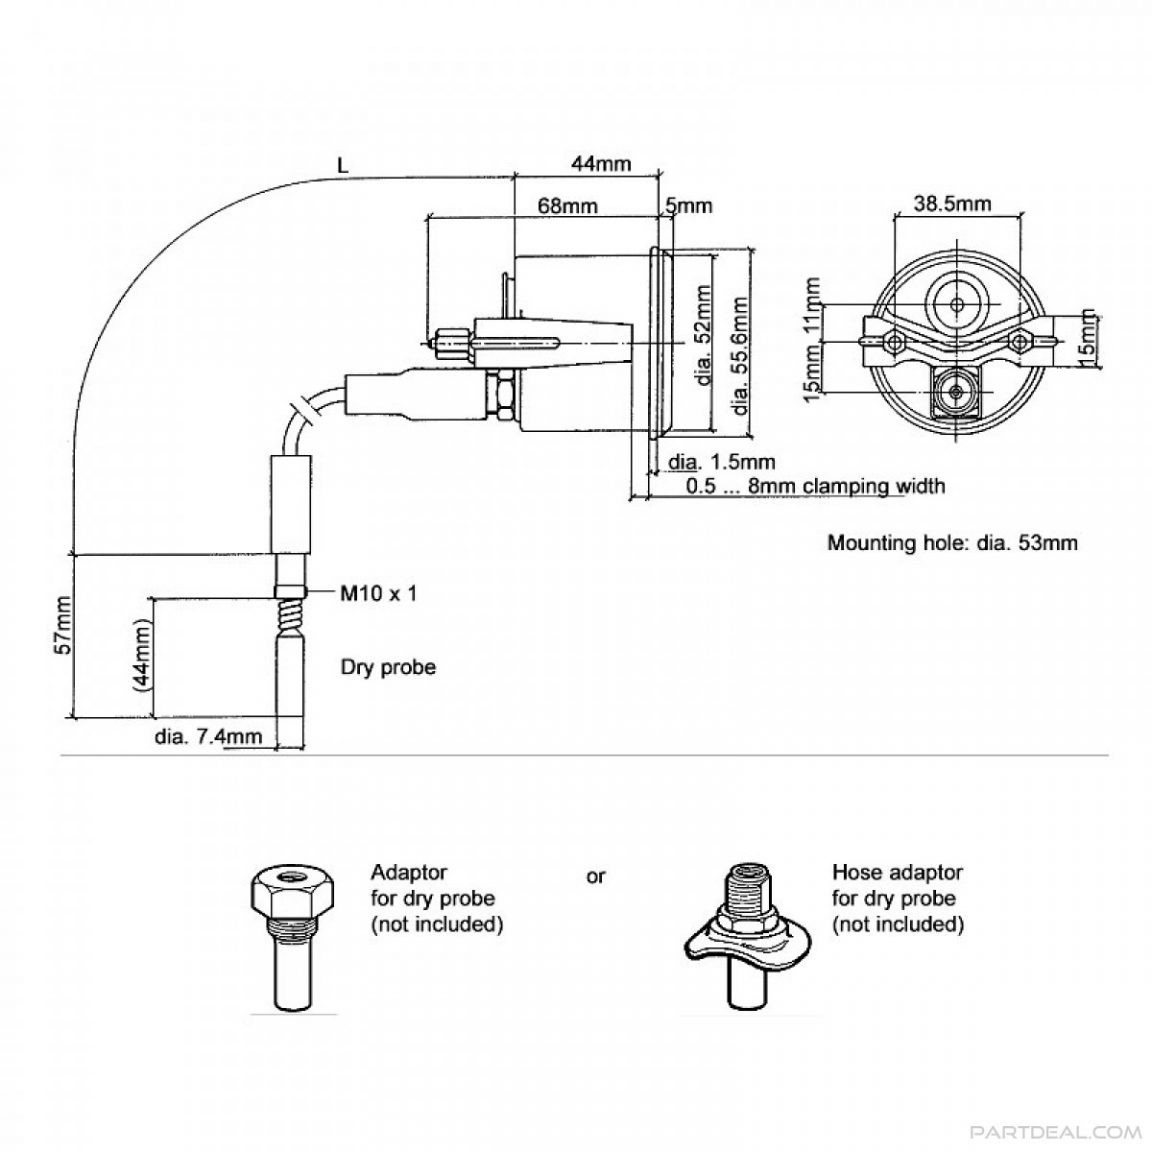 vdo oil pressure gauge wiring diagram 2 humbucker inspirational